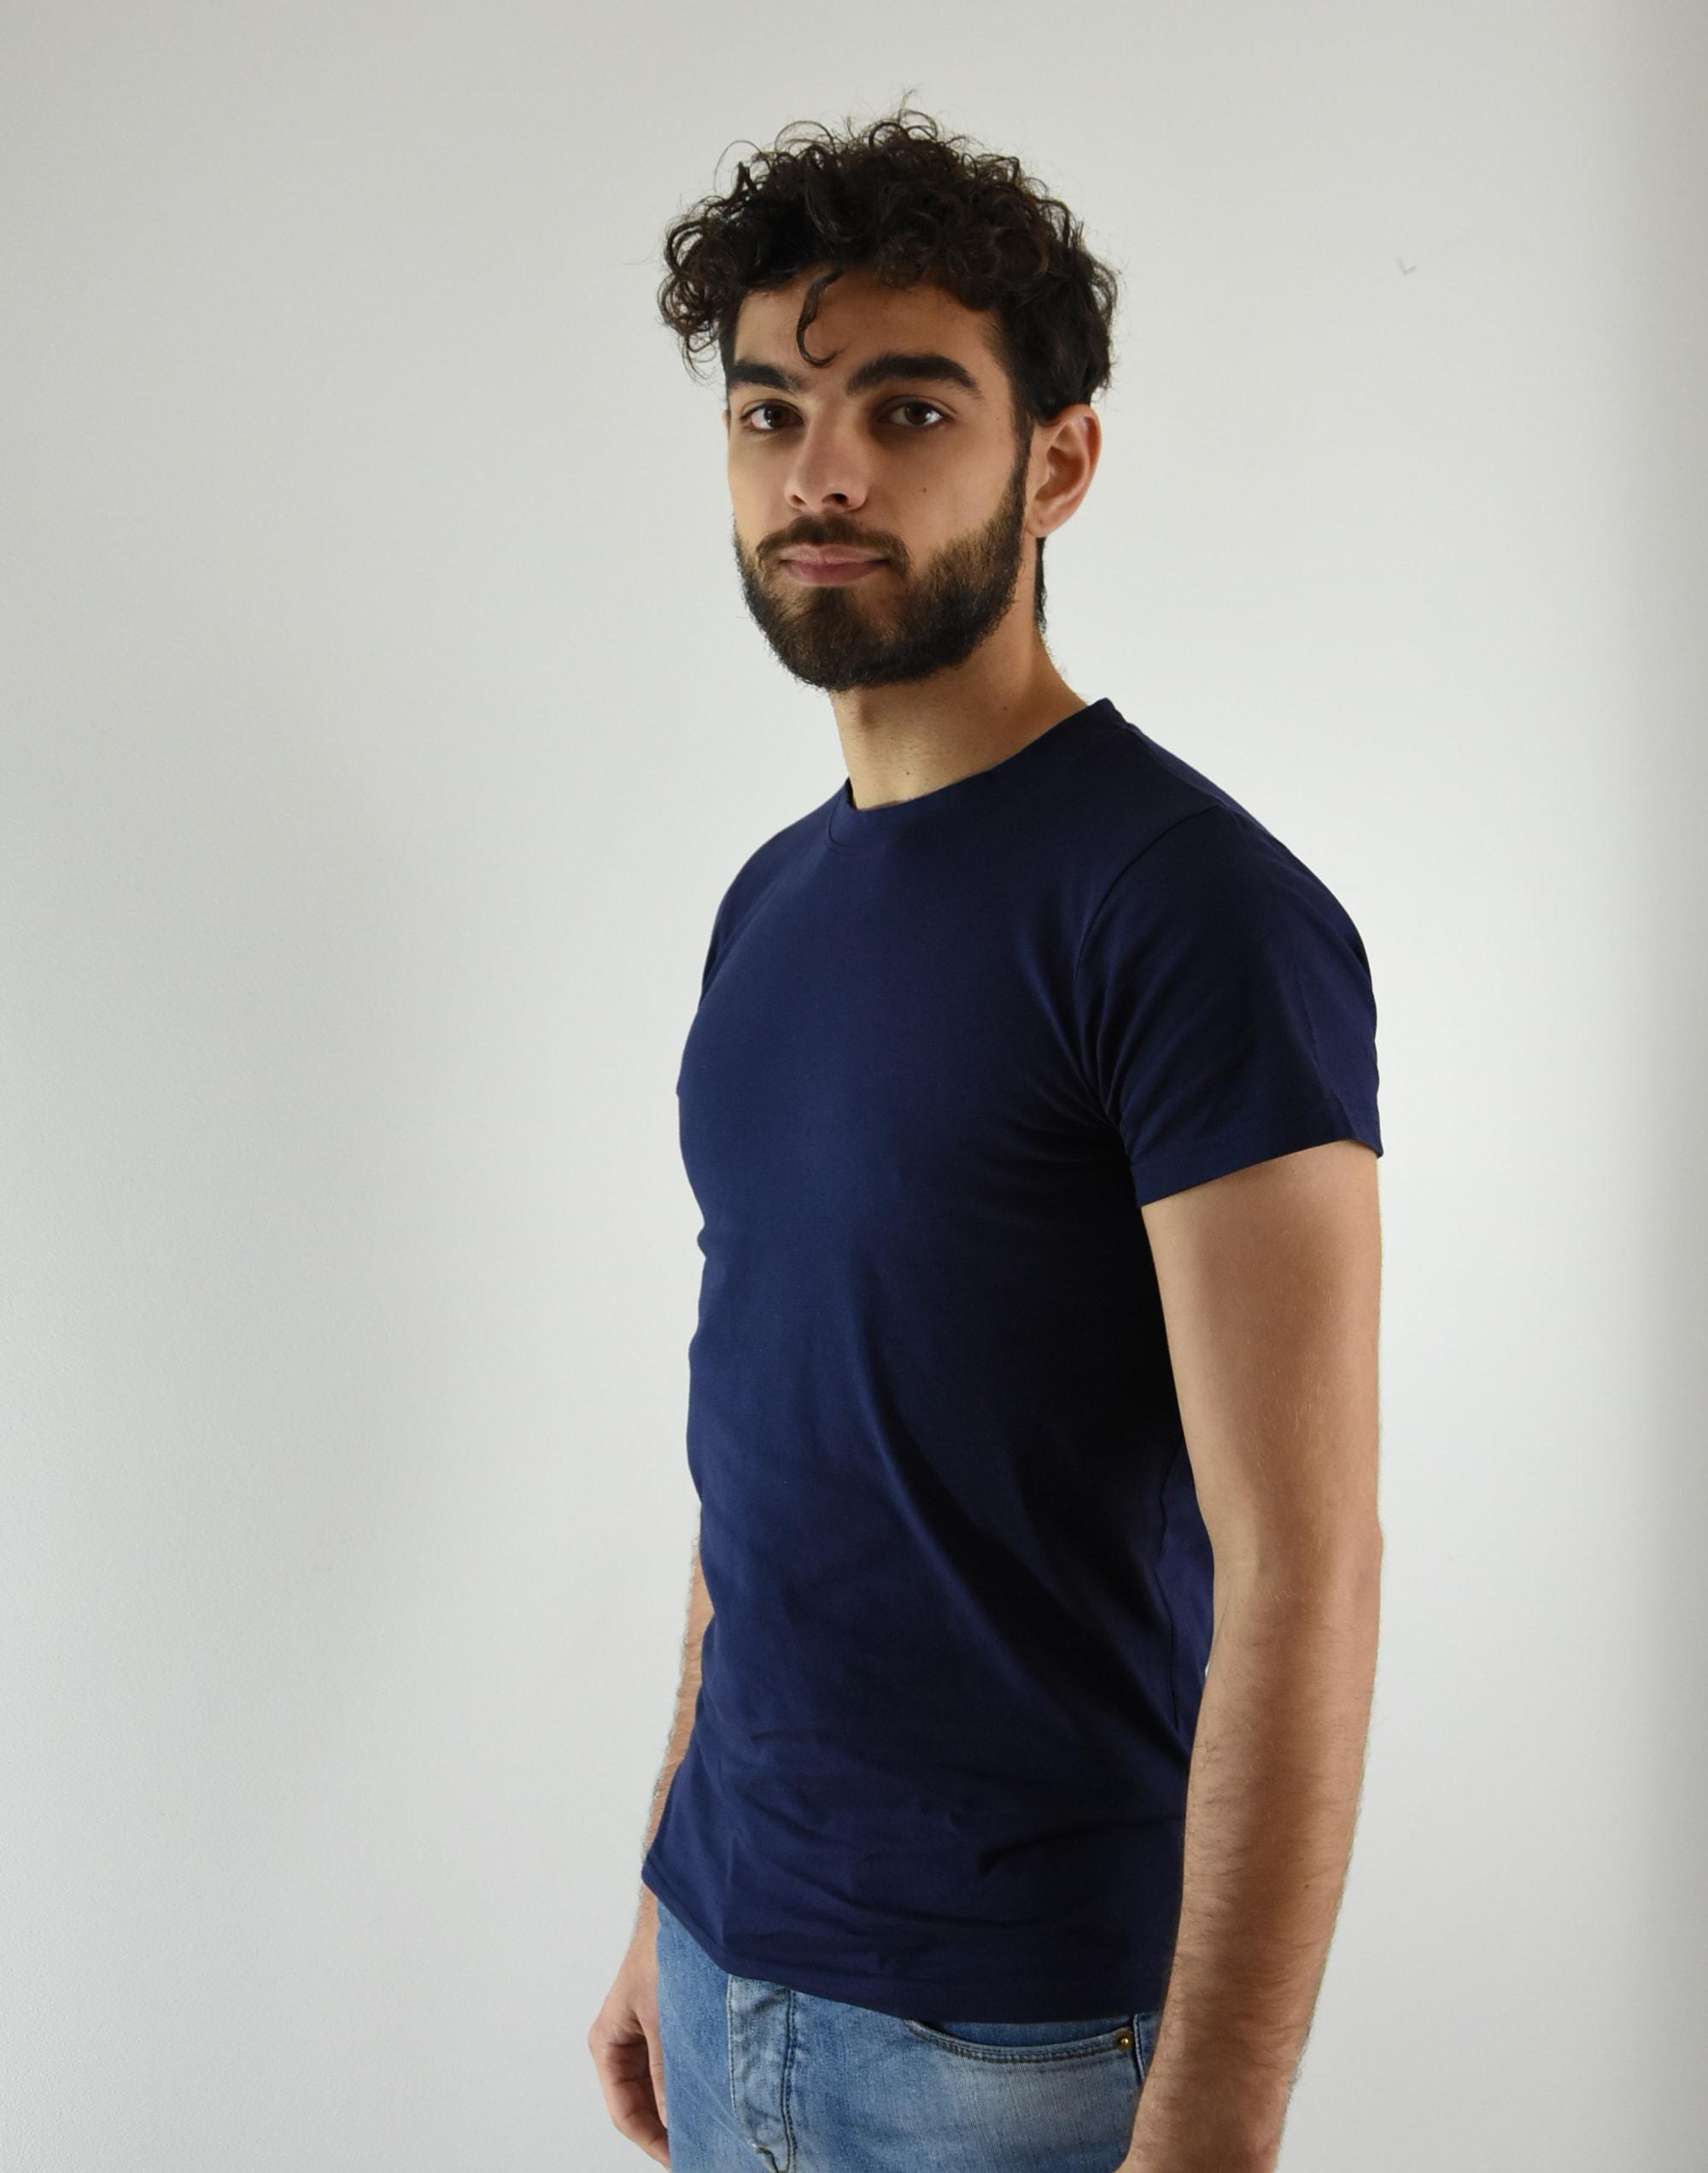 Rond Coton Tee En Homme Bio Bleu Col Shirt Marine FTclK1J